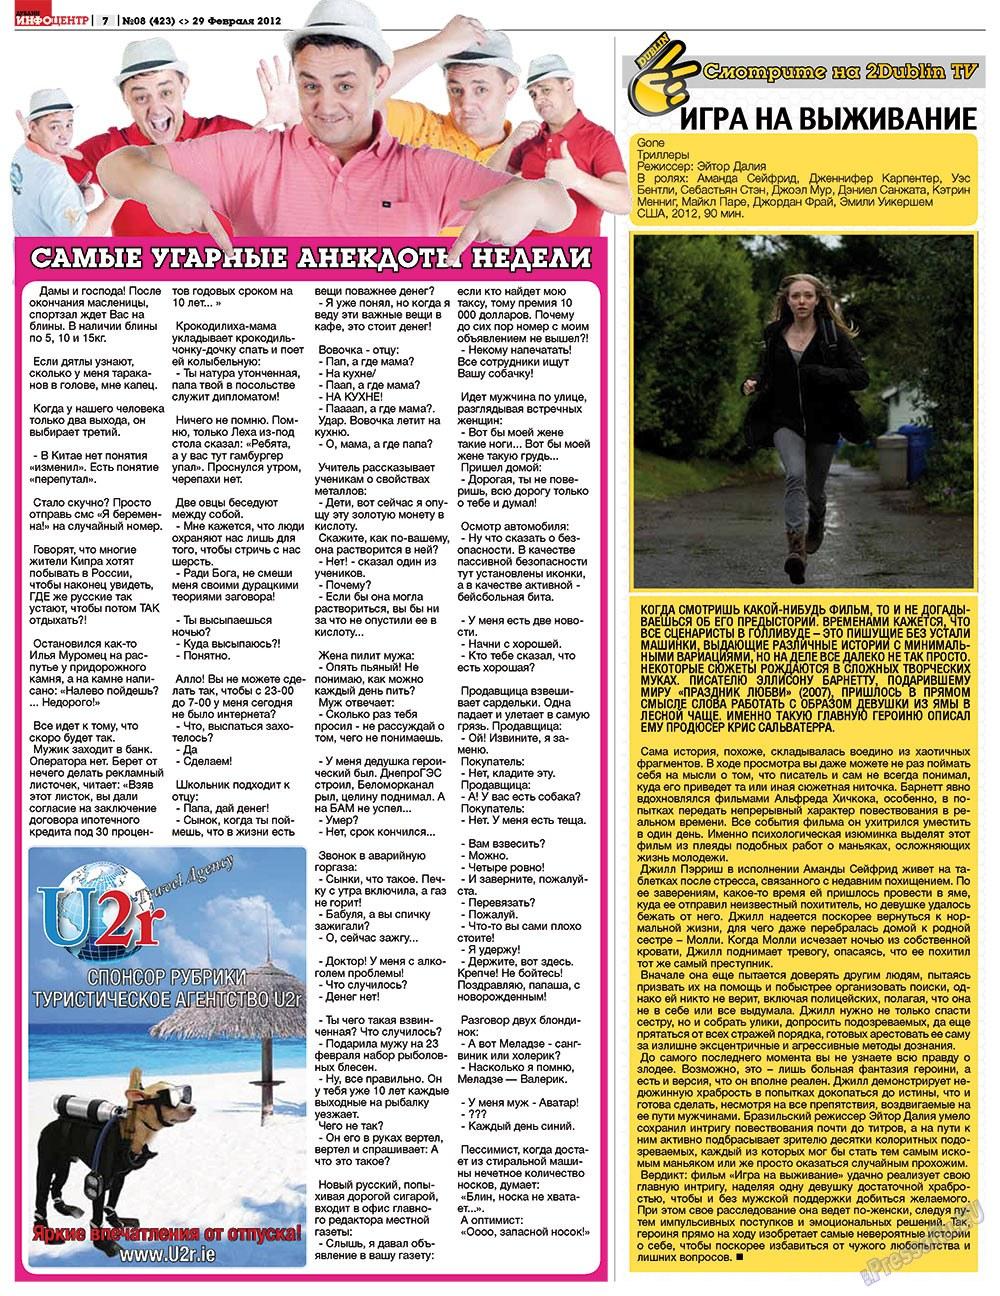 Дублин инфоцентр (газета). 2012 год, номер 8, стр. 7